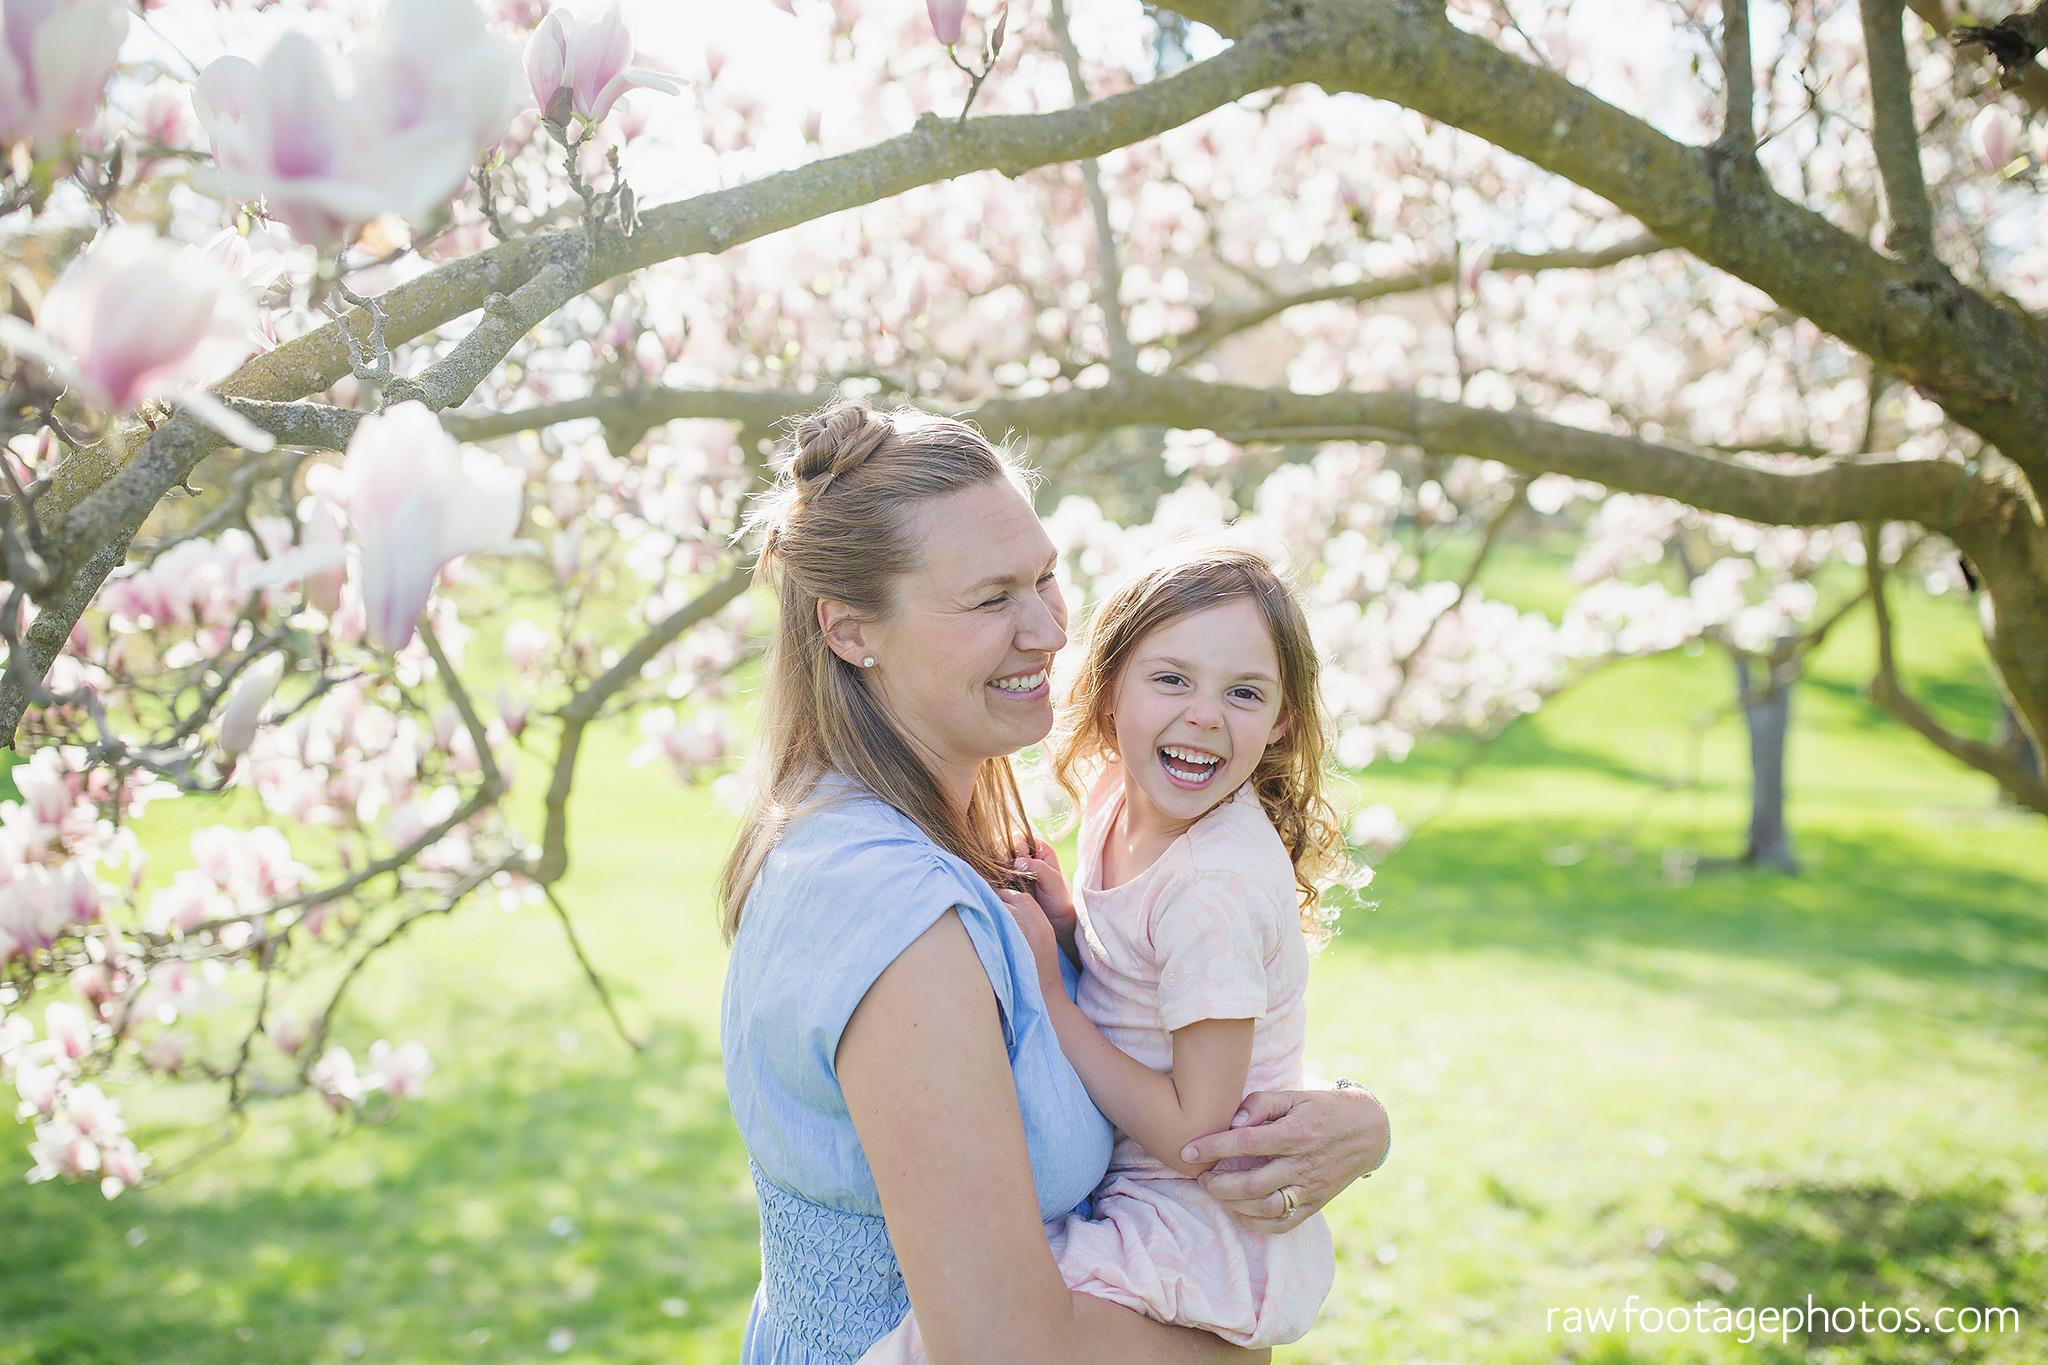 london_ontario_family_photographer-raw_footage_photography-spring_blossom_mini_sessions-magnolia-springbank_park018.jpg